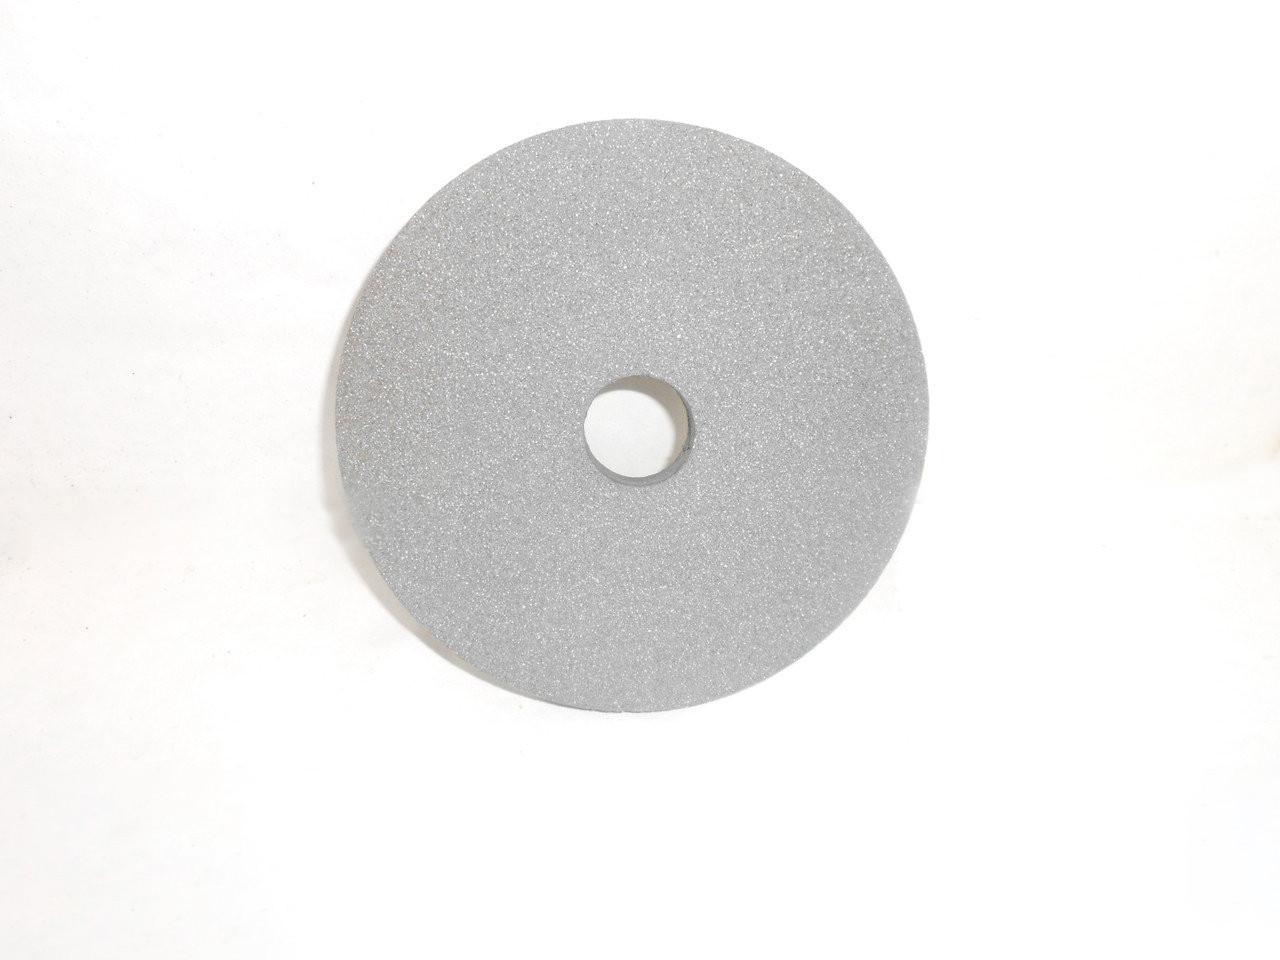 Круг шлифовальный 14А ПП 300х25х127  40 СМ